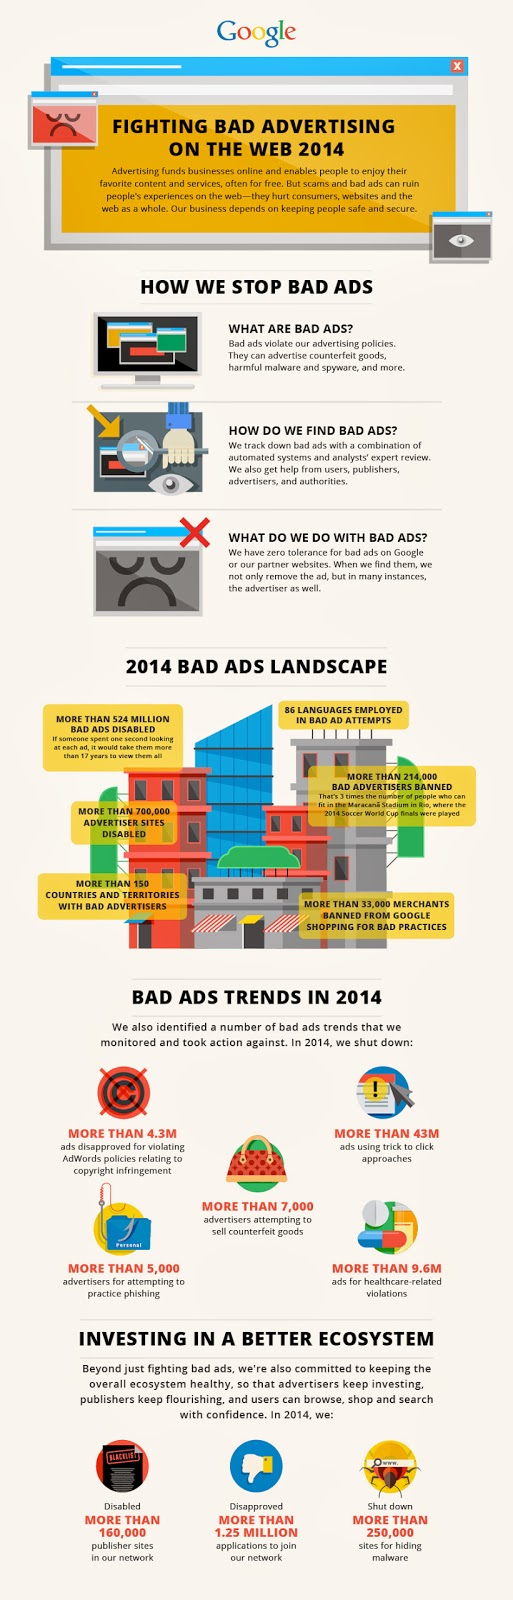 Bad Ads su Google Adwords: qualche cifra